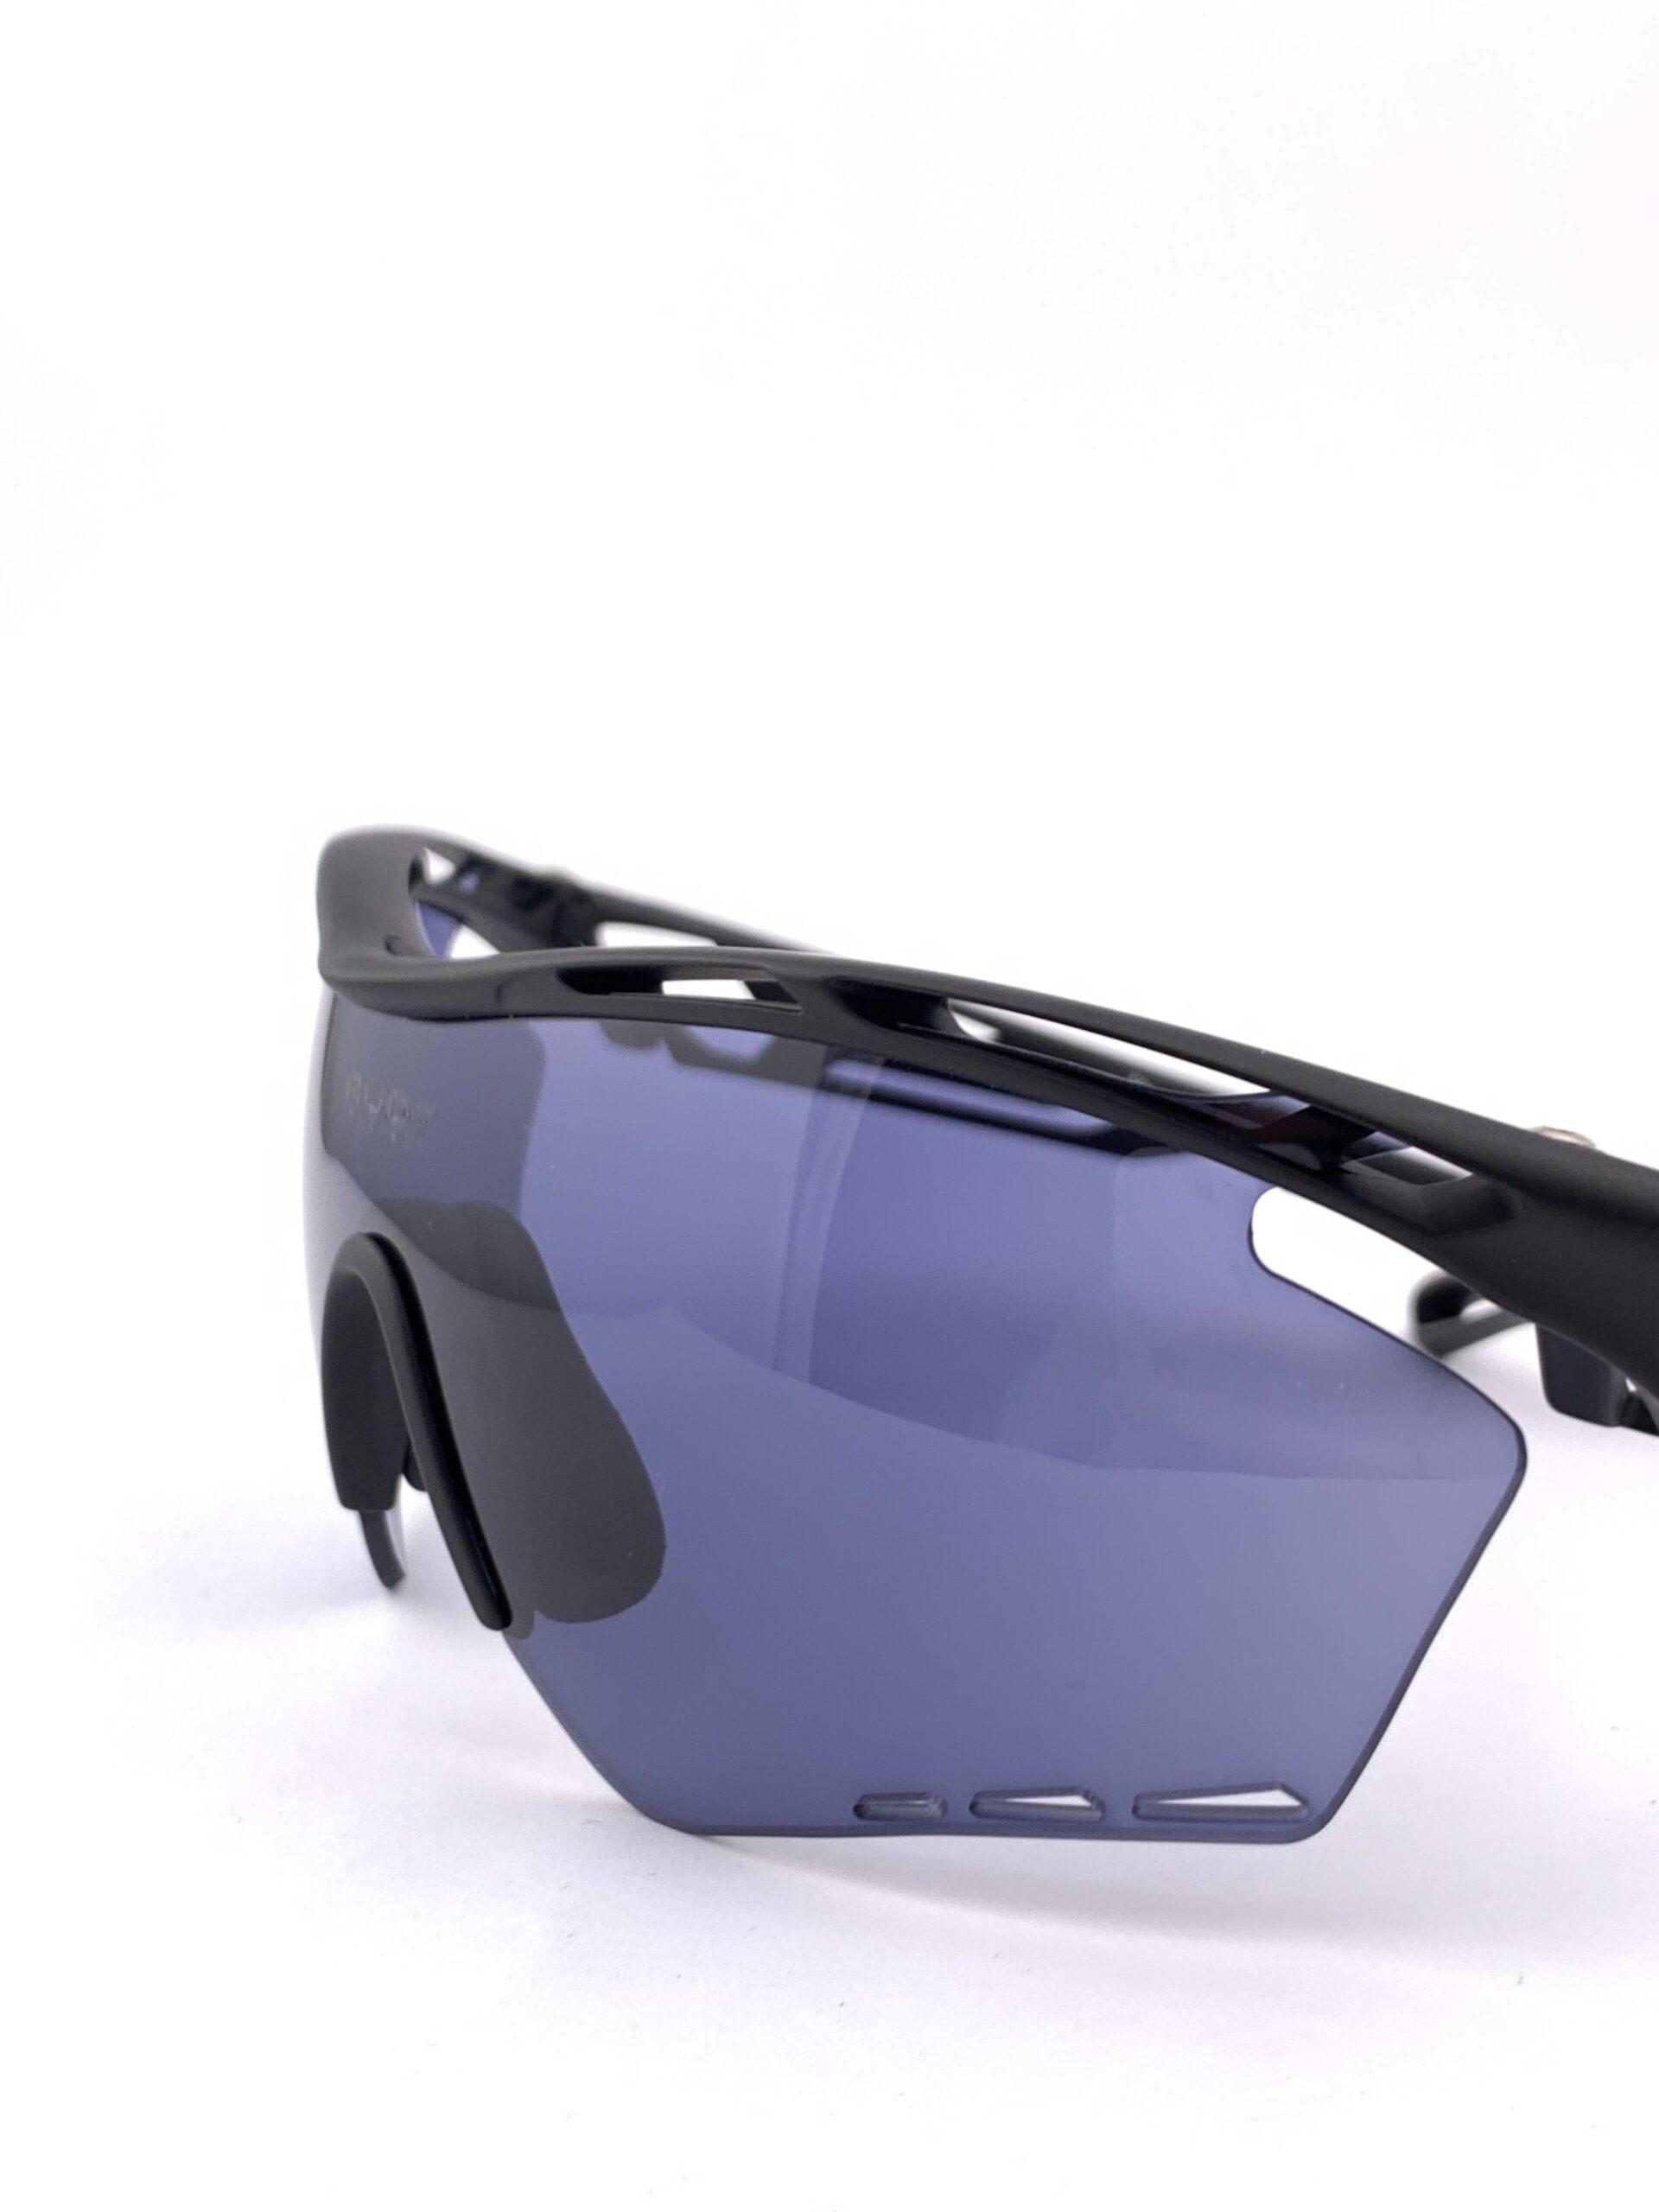 Cyklistické okuliare Tralyx čierne zboku